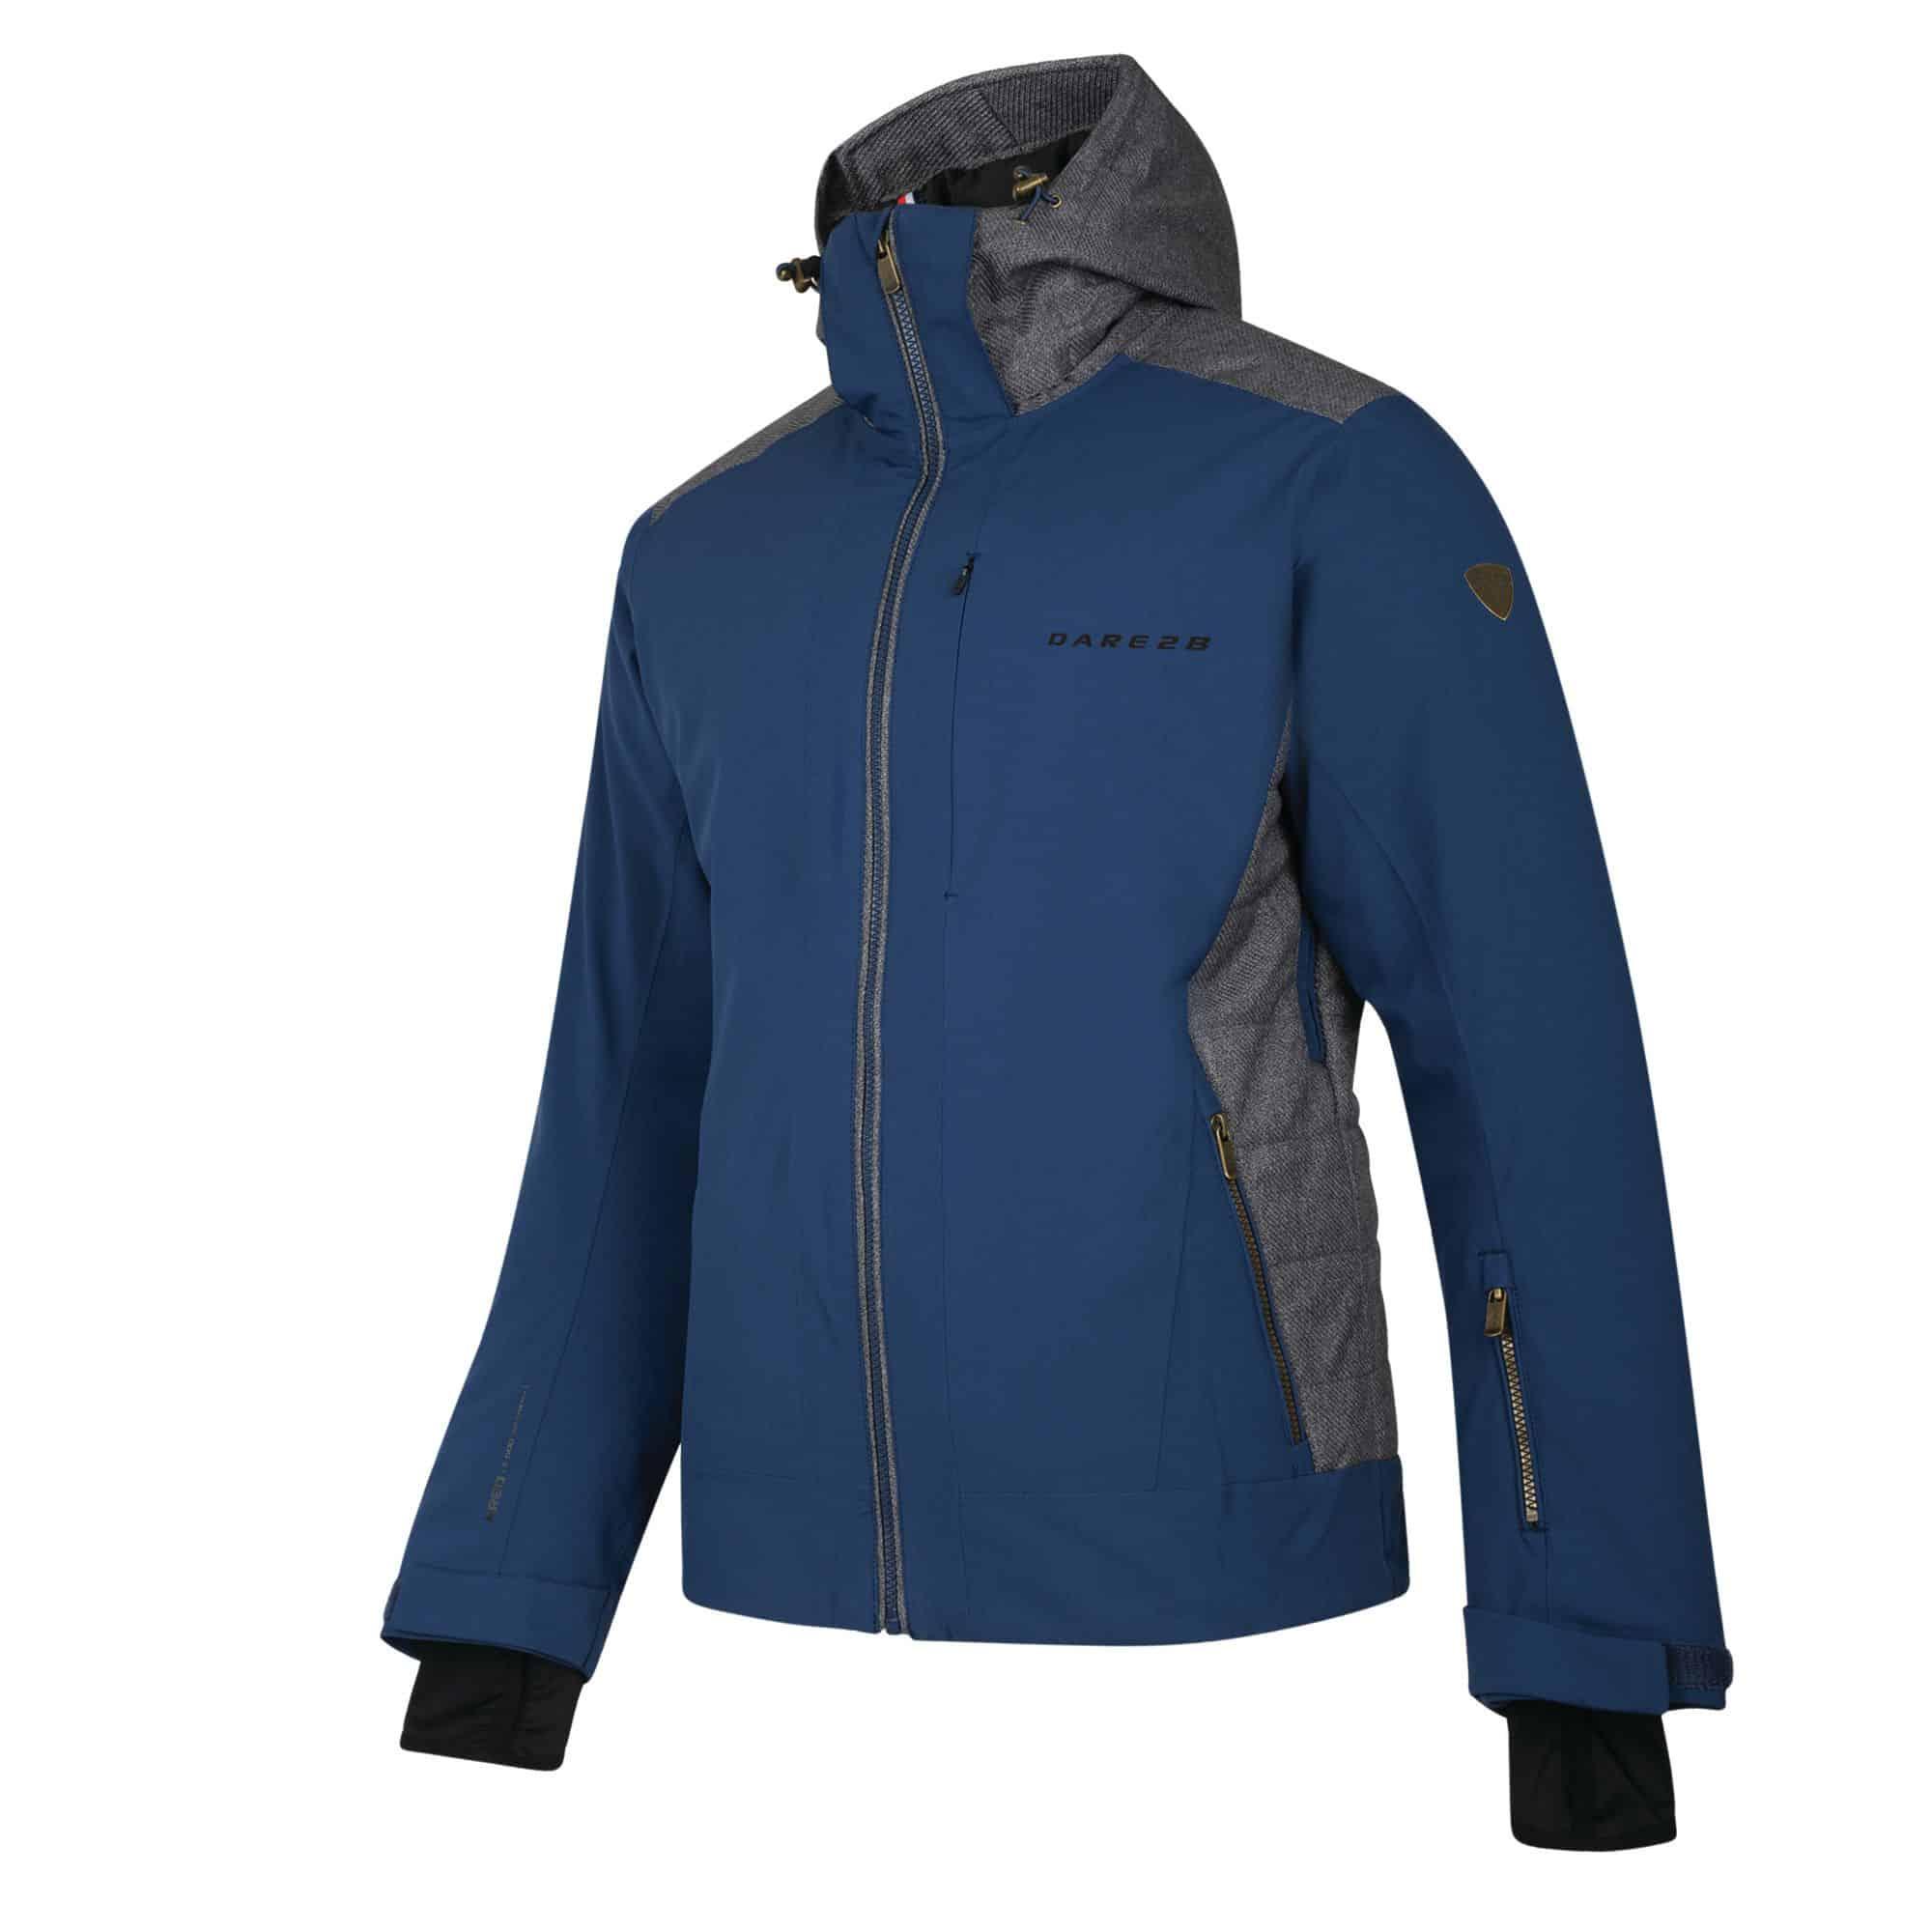 rendition 1718 jacket seville blue and grey